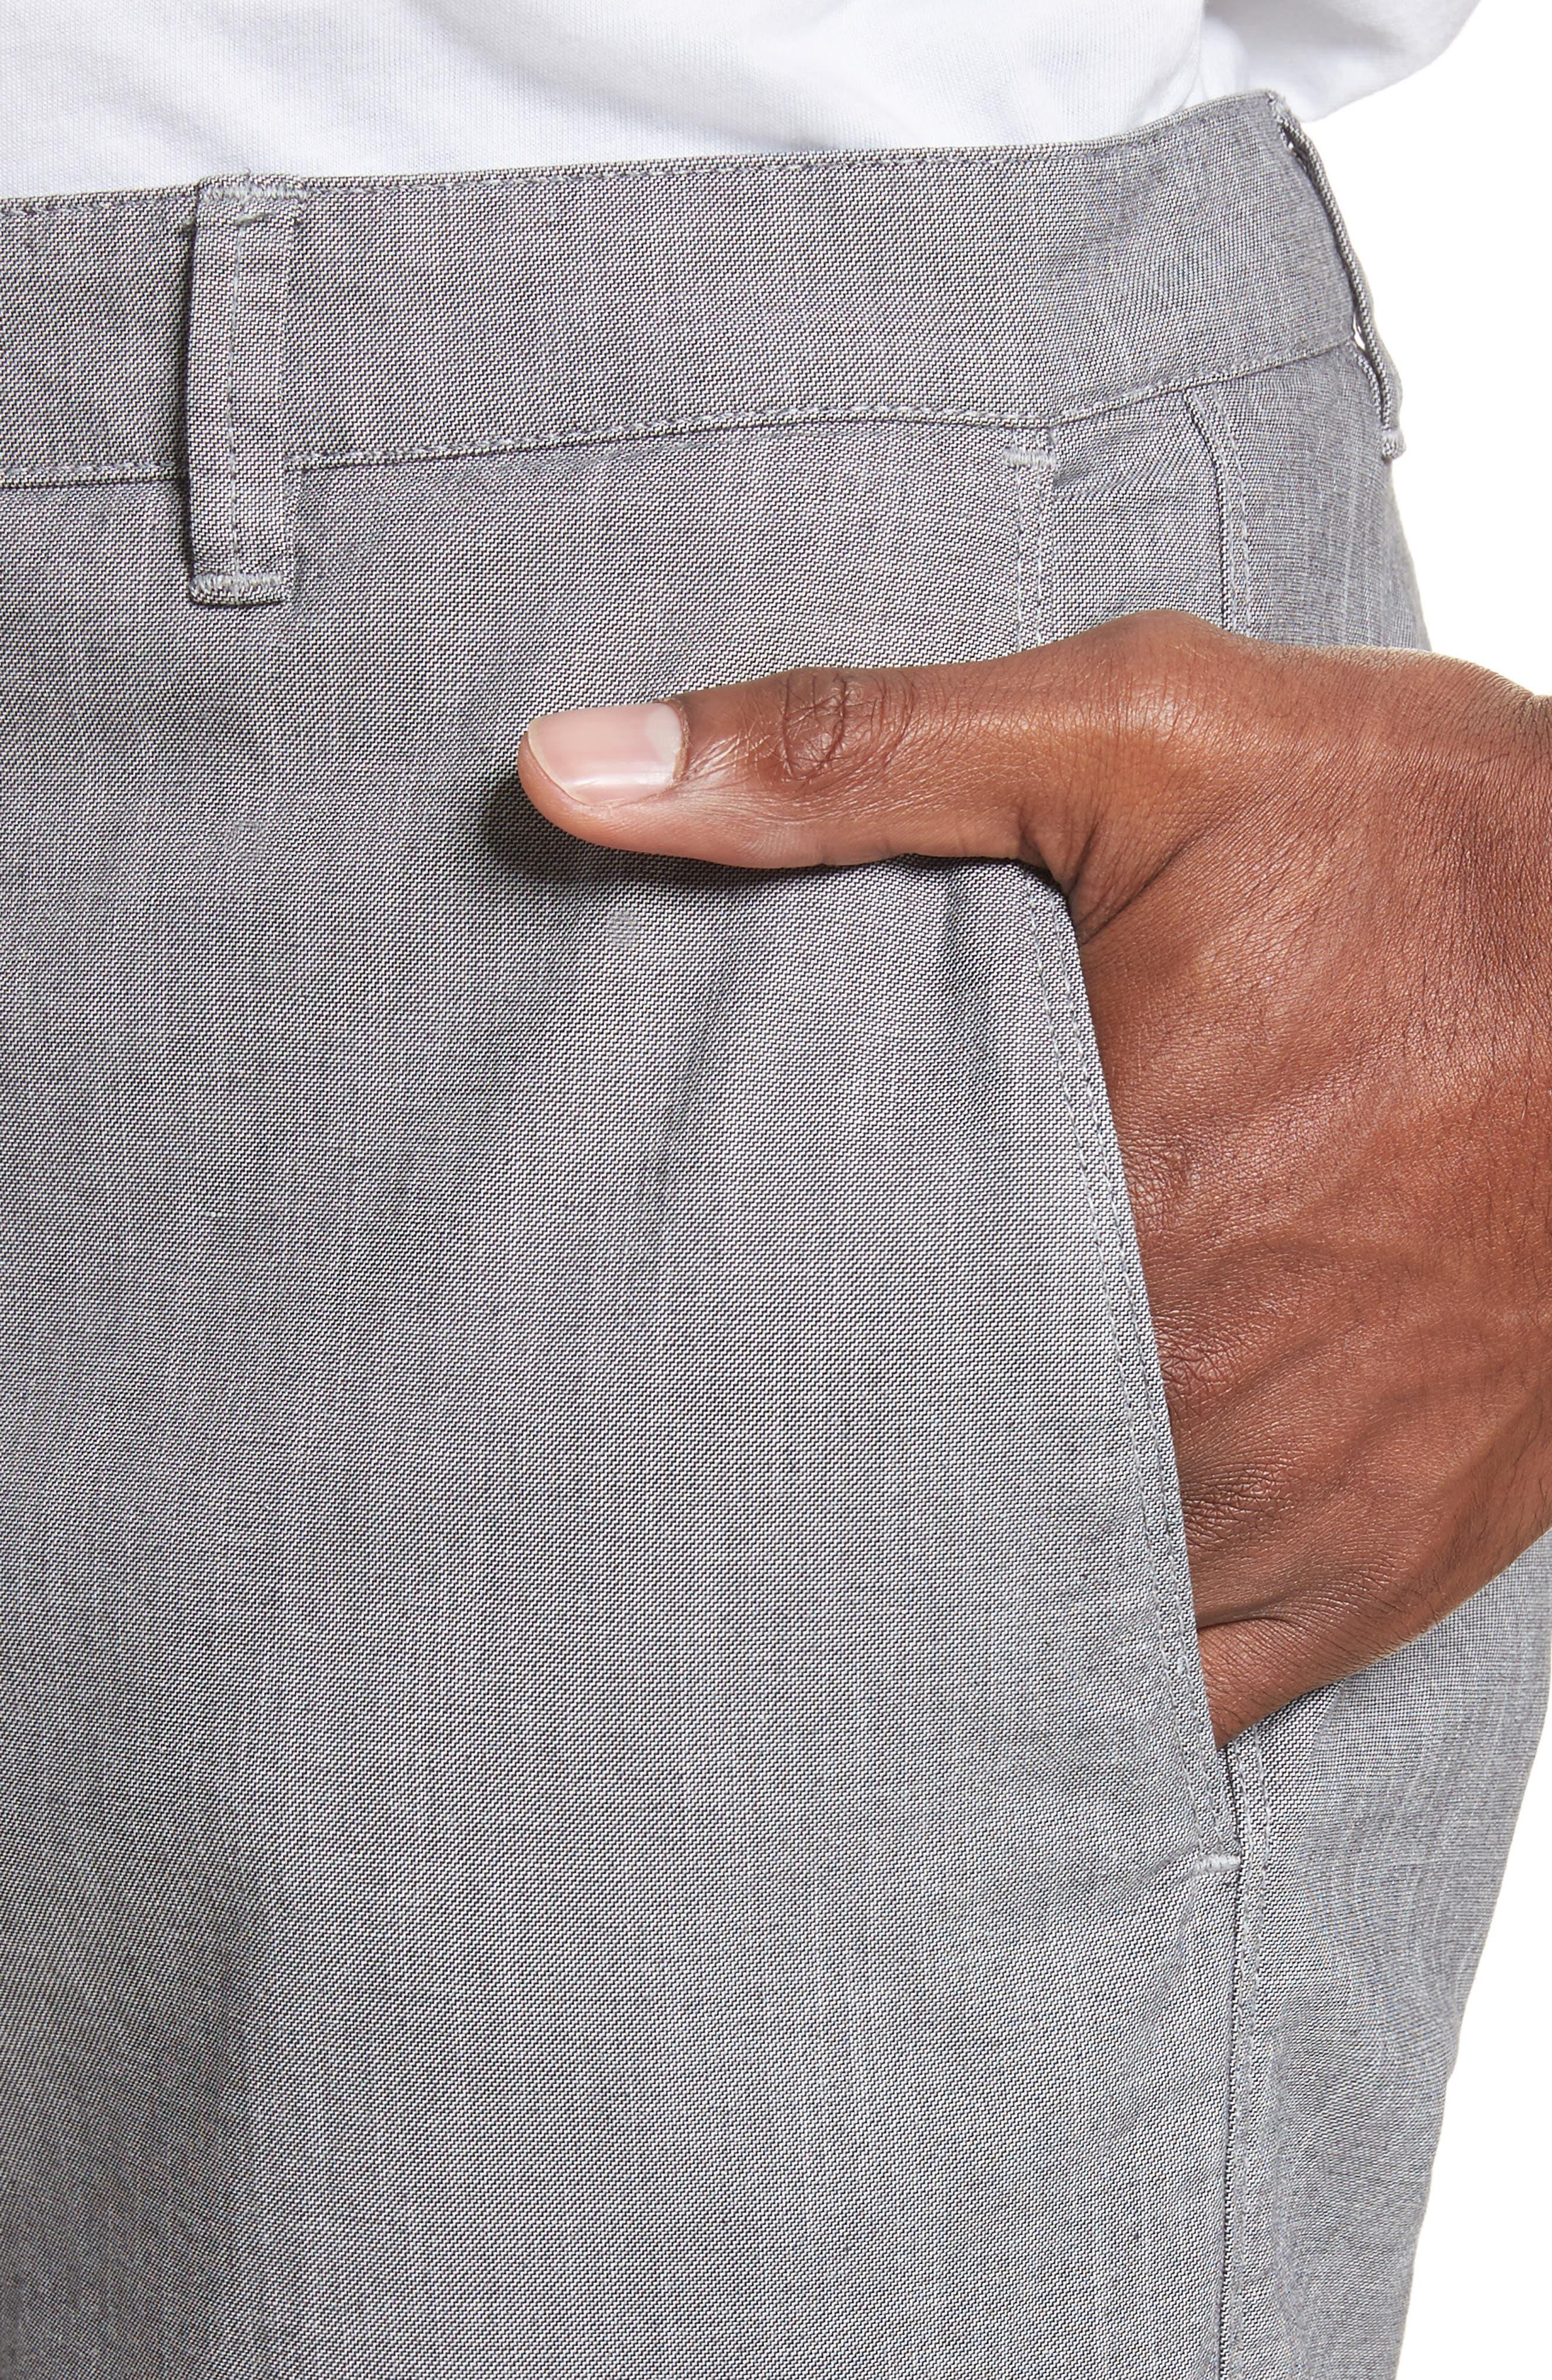 French Pocket Stretch Straight Leg Pants,                             Alternate thumbnail 4, color,                             Grey